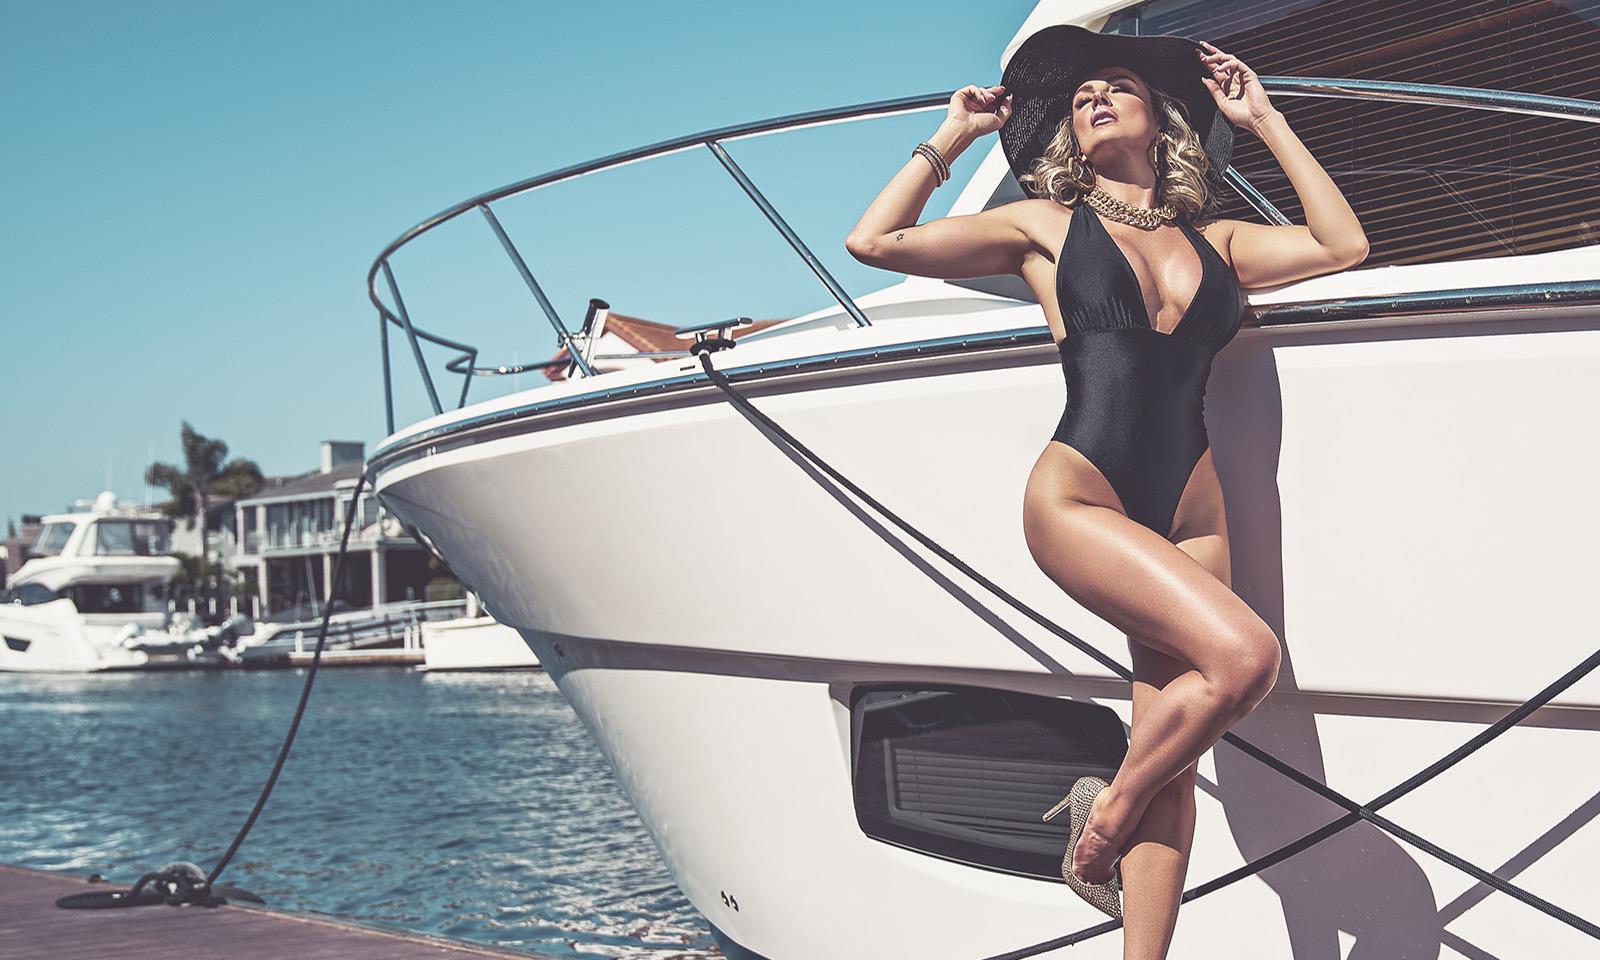 amber-nichole-miller-Shawn-Ferjanic-photoshoot-model-leaning-against-boat-main-image